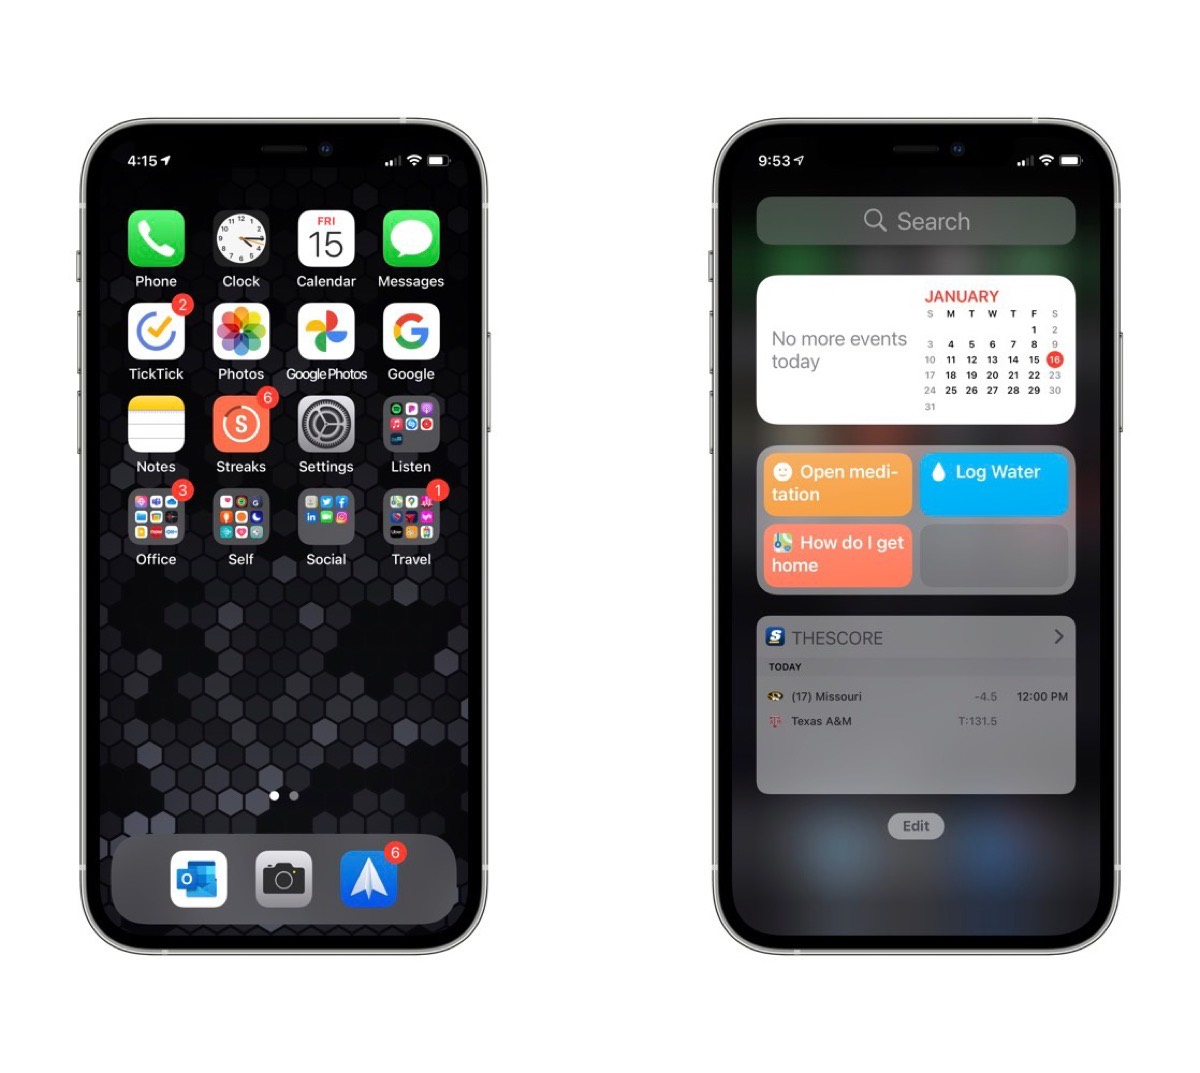 Bart Kesner's iPhone